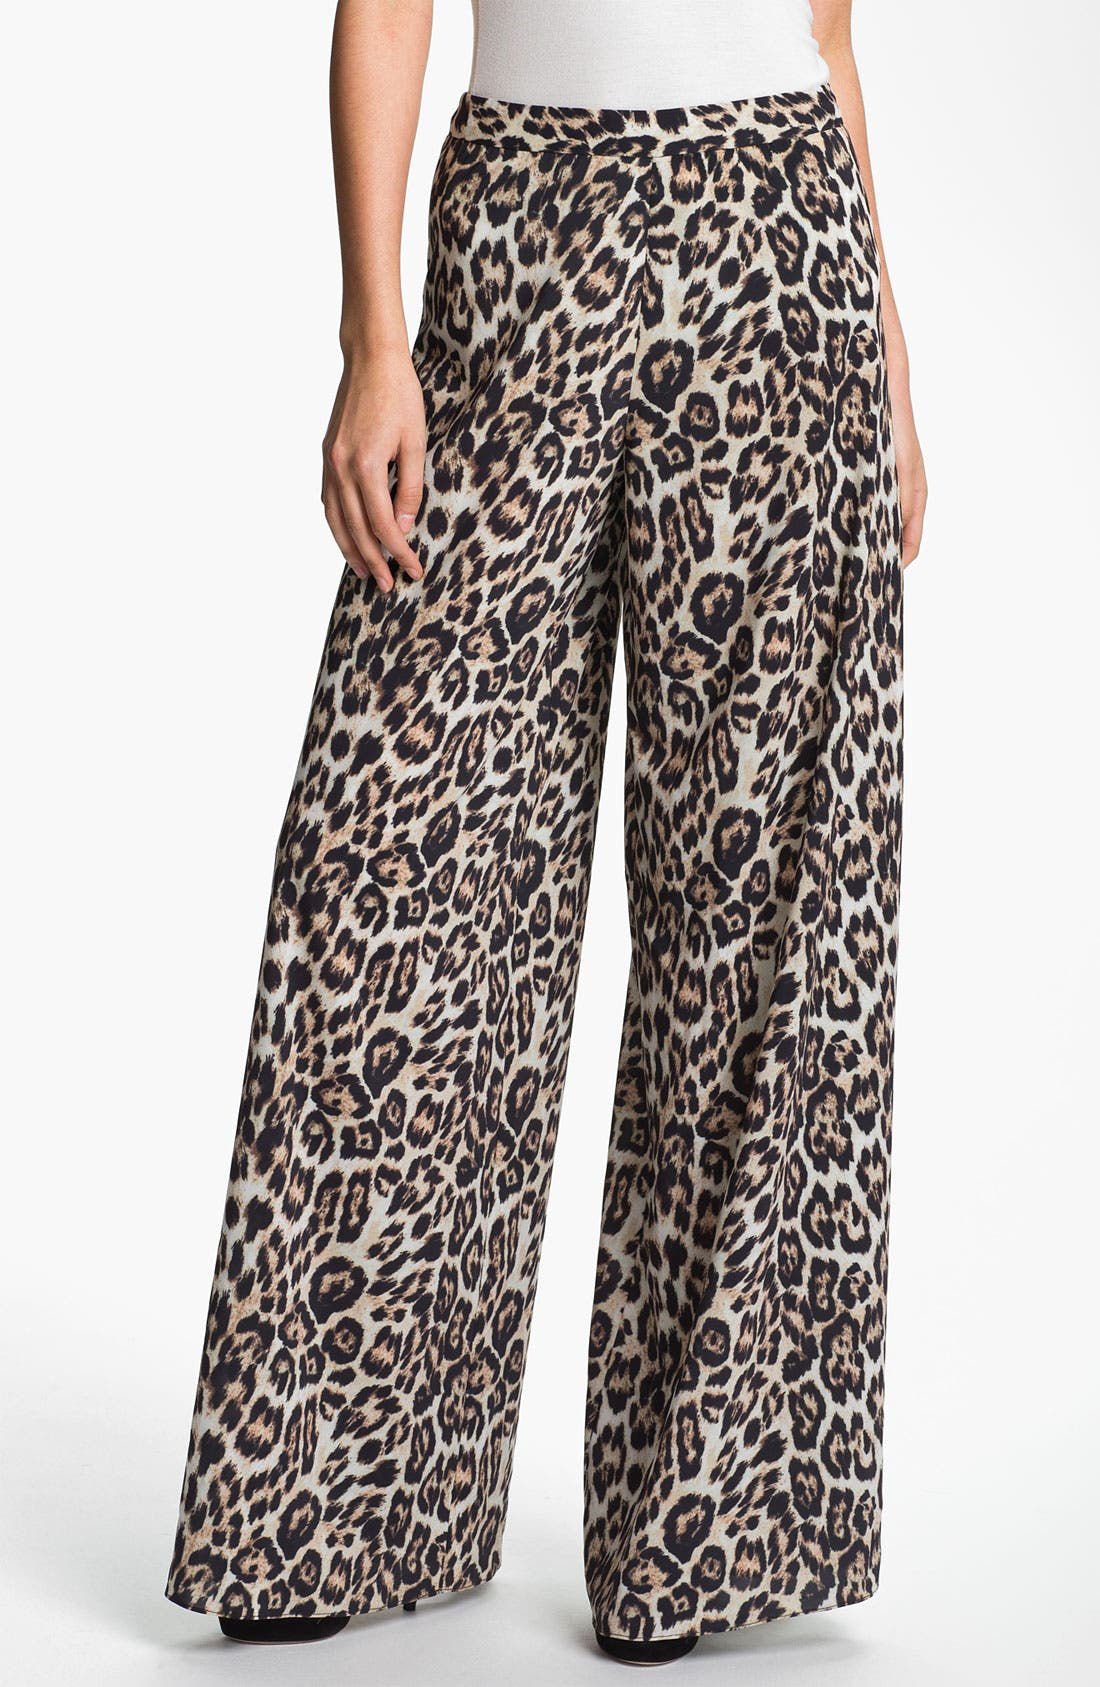 Alternate Image 1 Selected - Alice + Olivia Leopard Print Wide Leg Pants